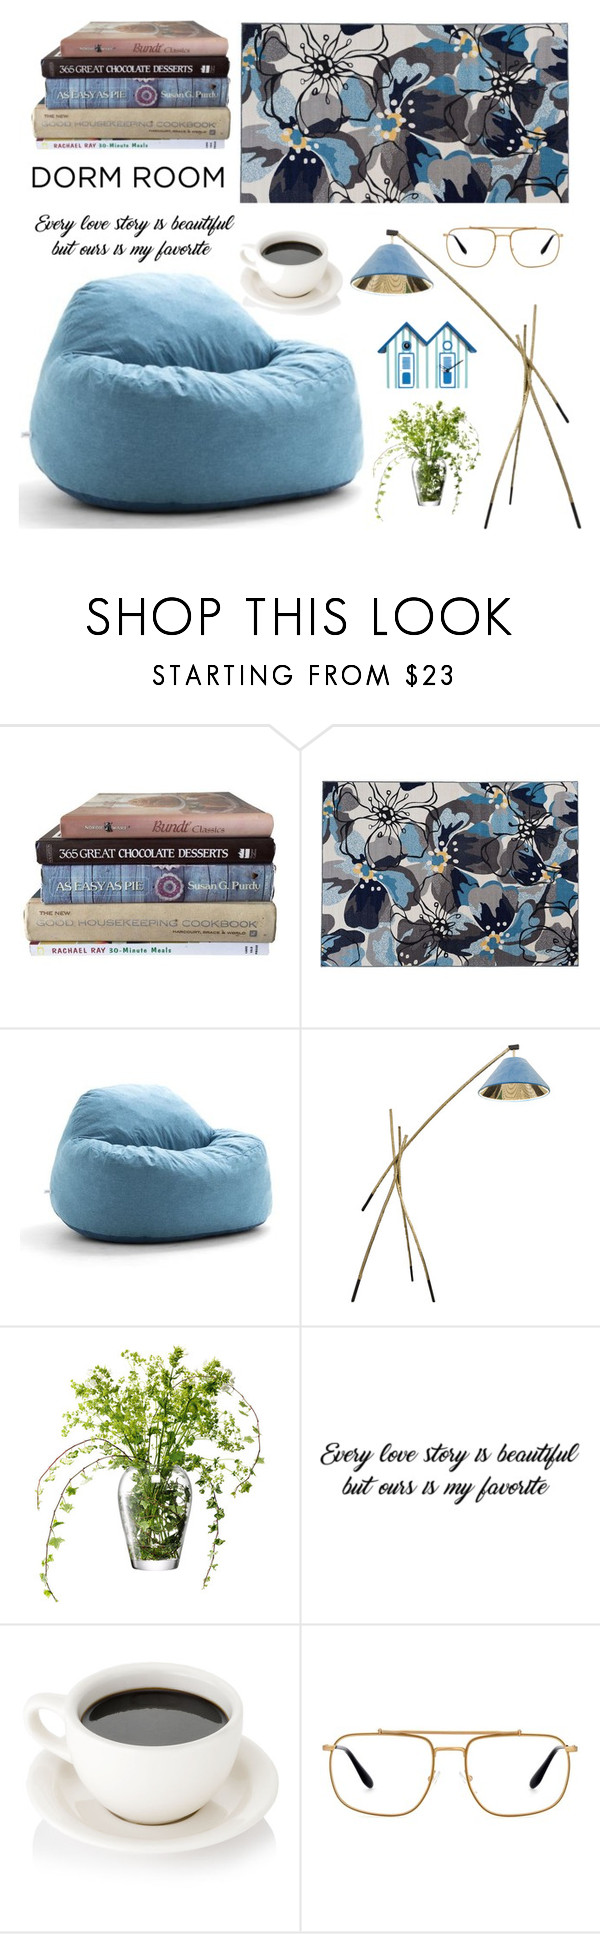 """blue room"" by tijana-tanasic-ex-lecic ❤ liked on Polyvore featuring interior, interiors, interior design, home, home decor, interior decorating, World Rug Gallery, Big Joe, LSA International and Prada"